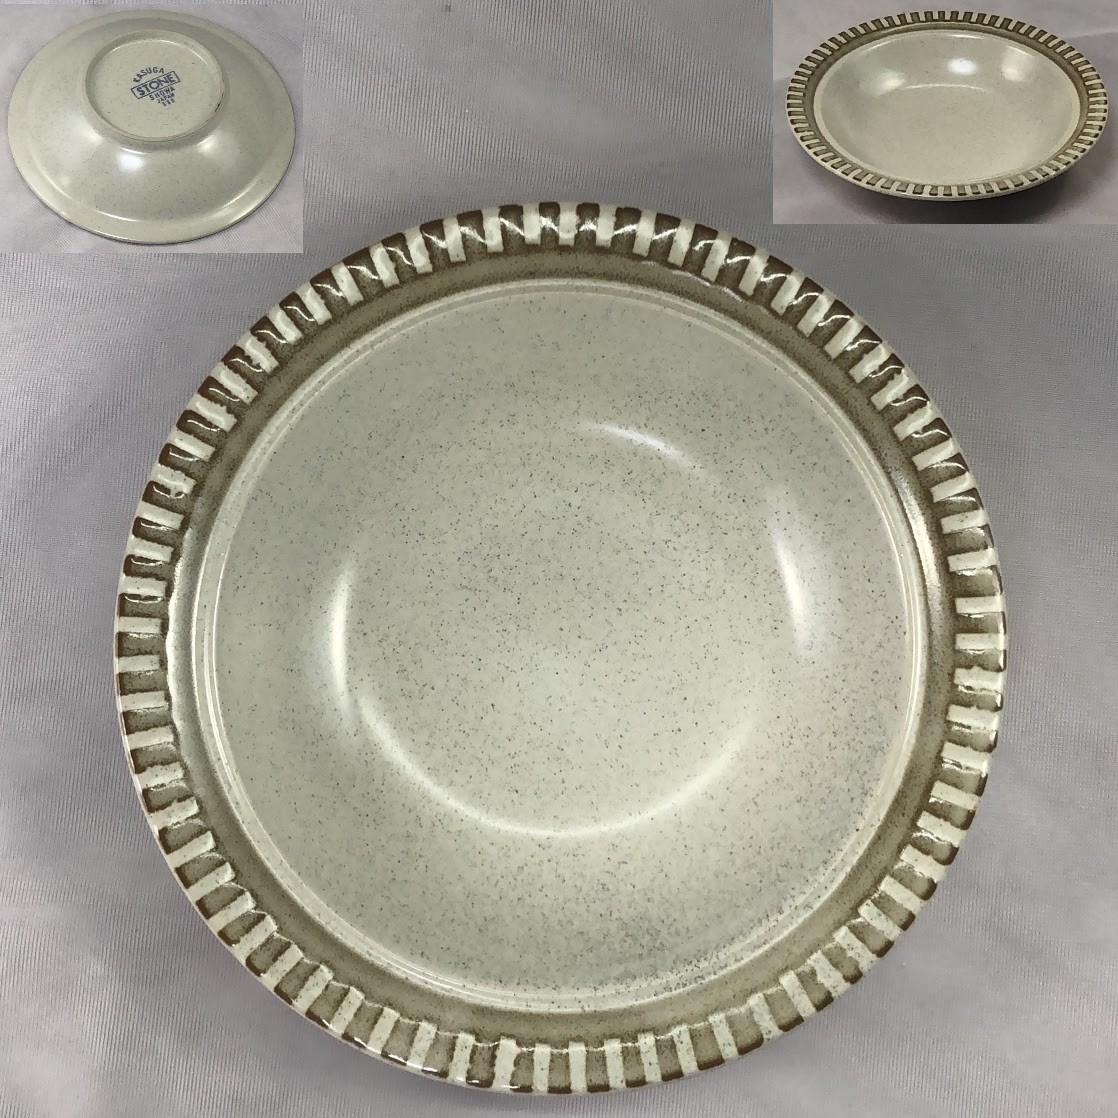 KASUGAストーンウェアベリー皿